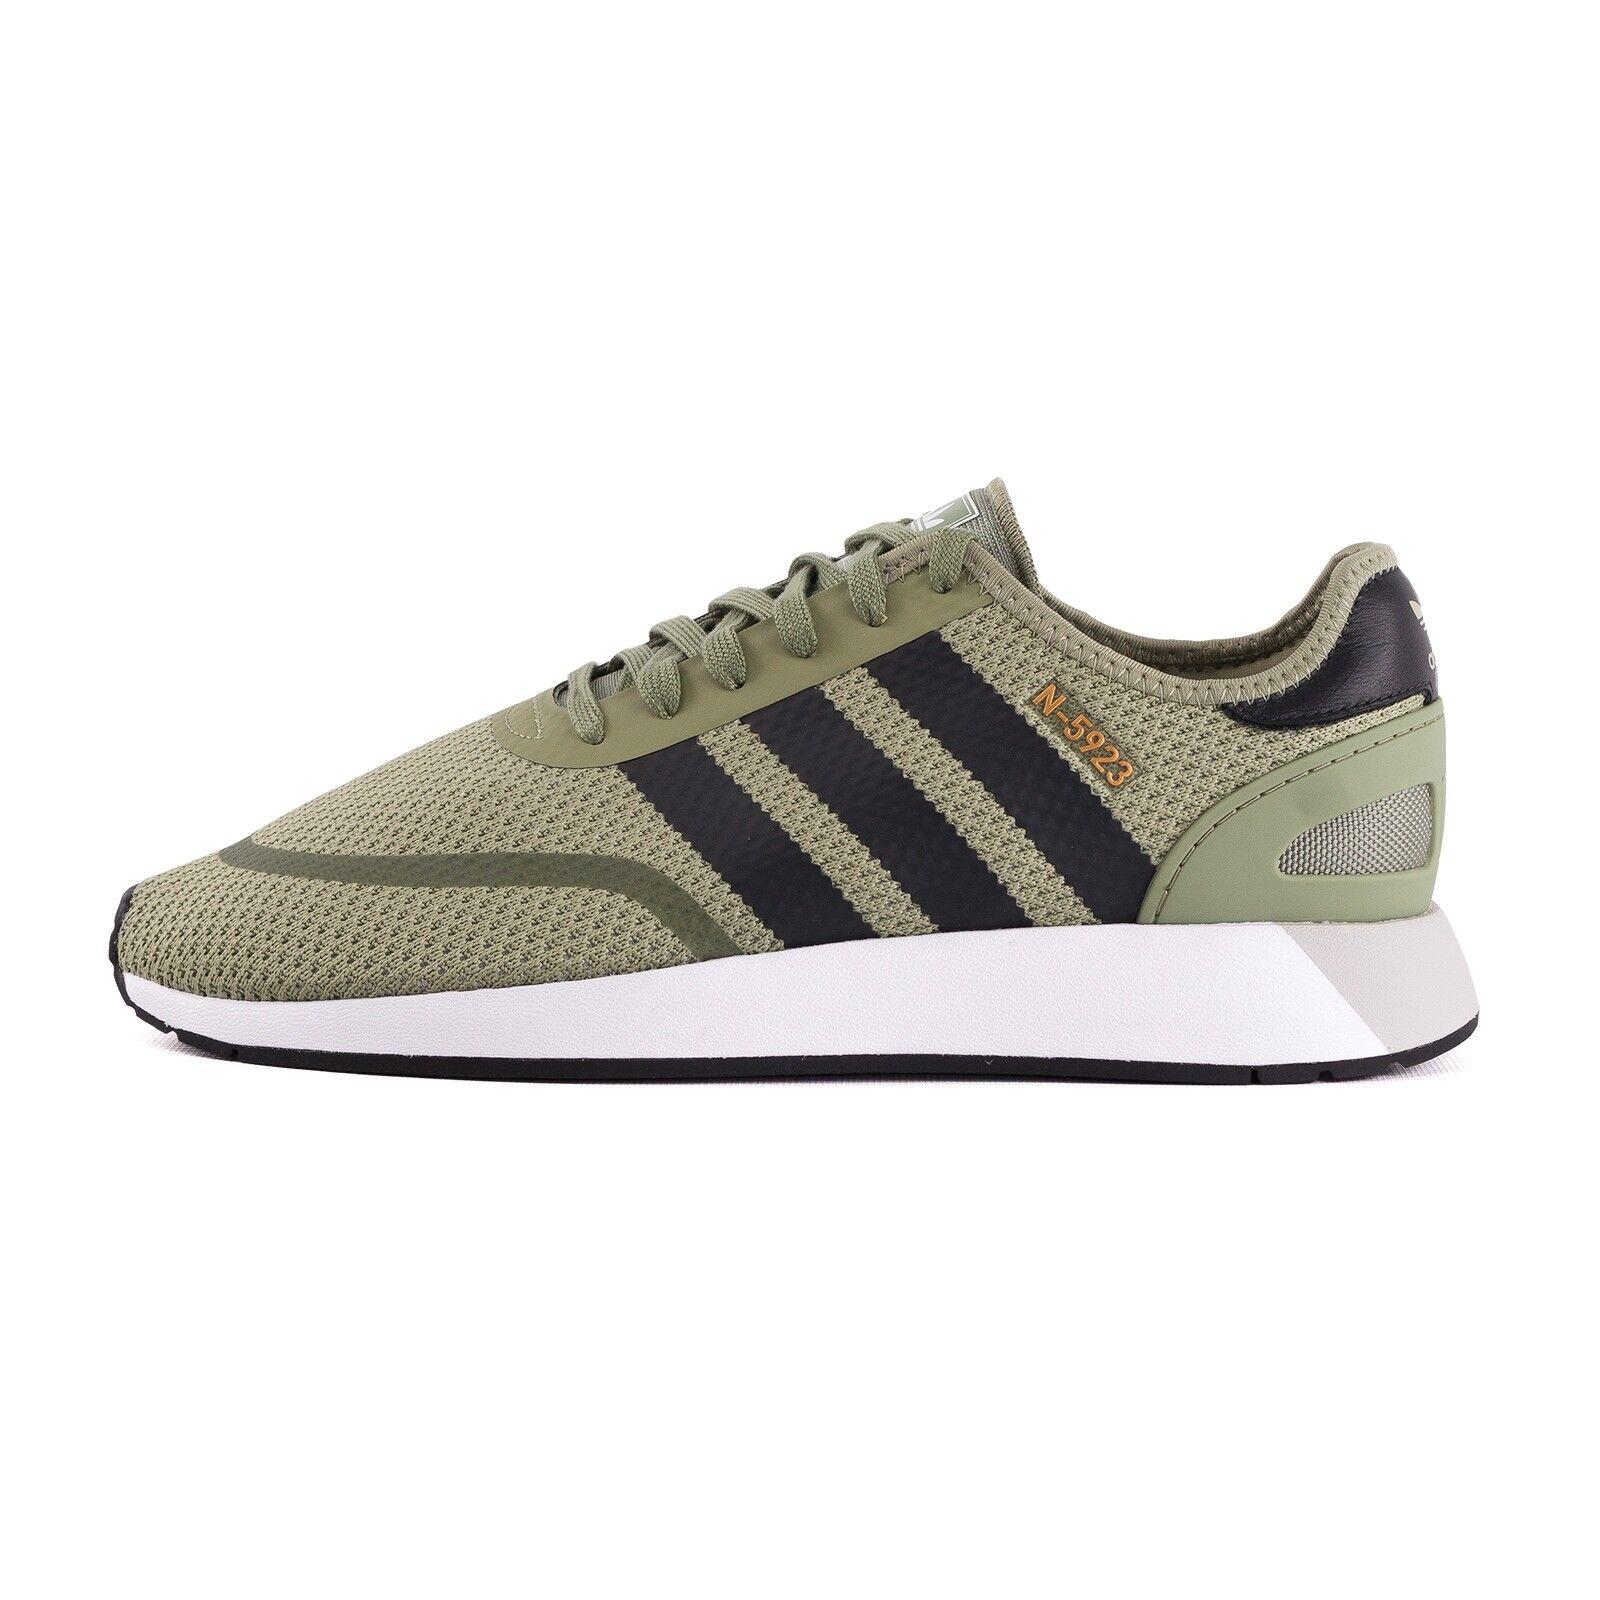 Adidas N-5923 Herrenschuh Sneaker grün 51378